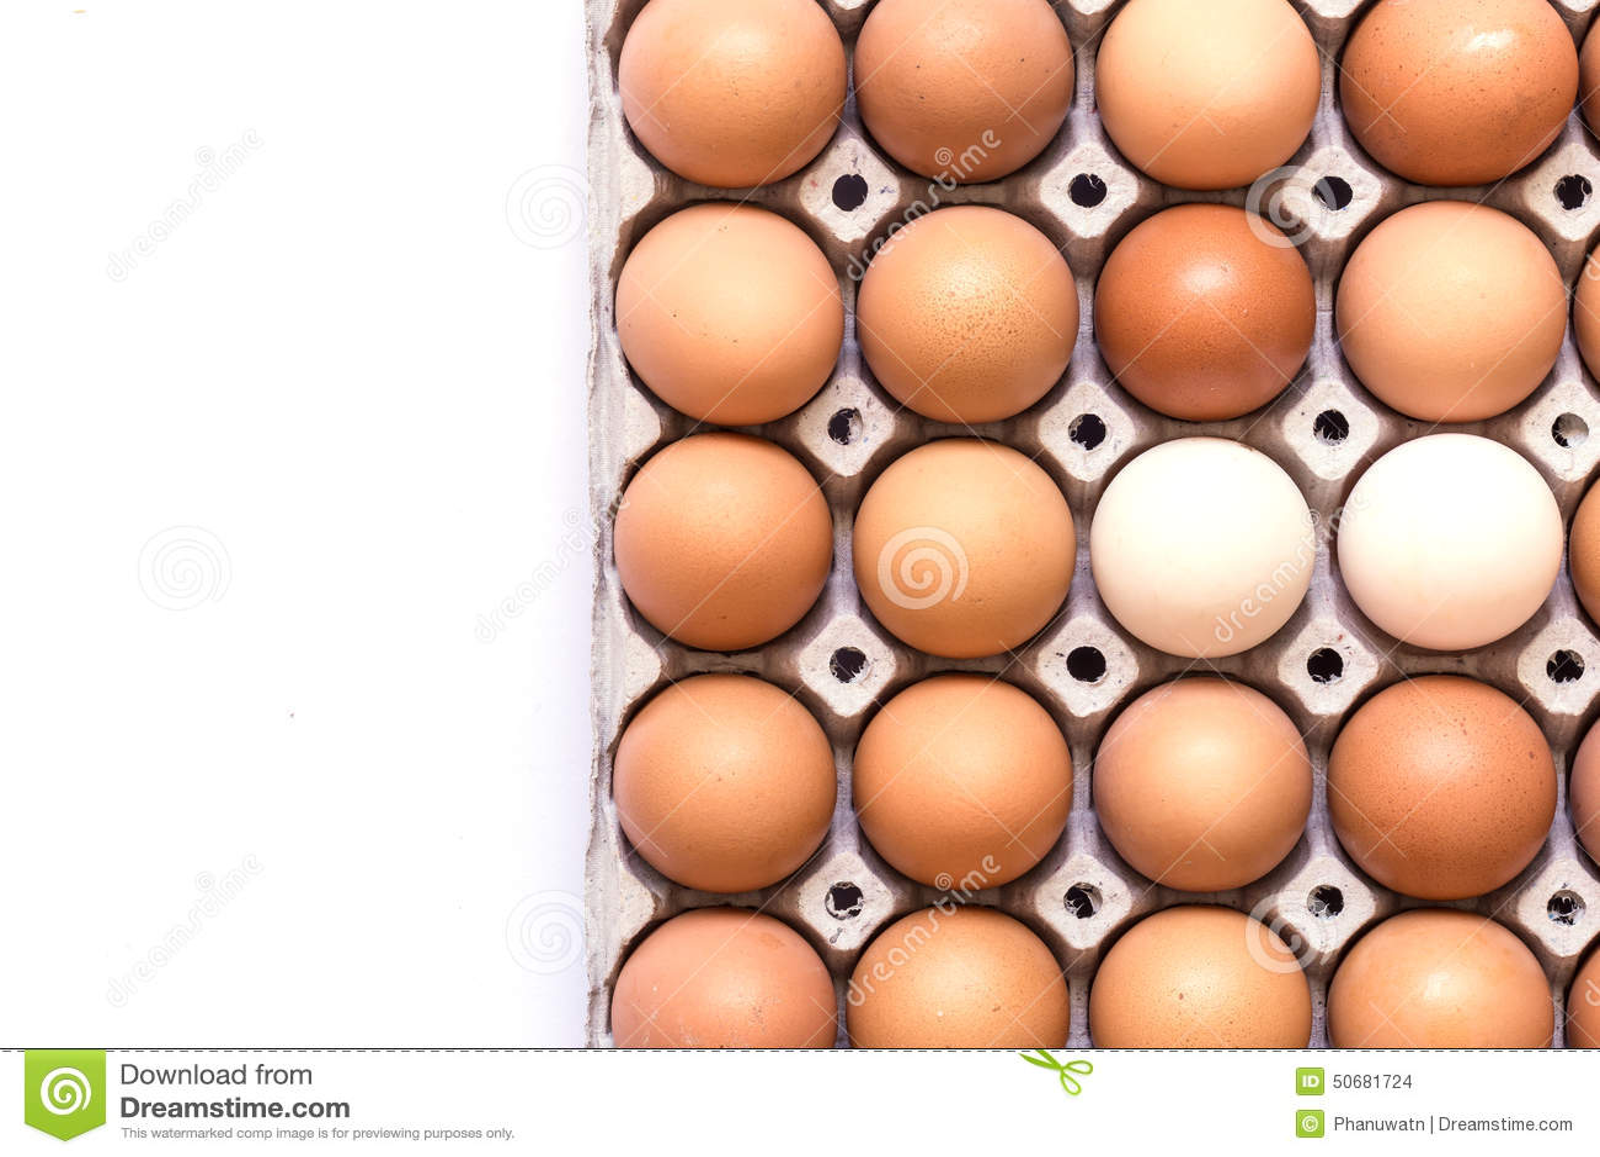 Download 怂恿载纸盘 库存照片. 图片 包括有 纸板, 新鲜, 健康, 营养, 编号, 鸡蛋, 食物, 背包, 敌意 - 50681724